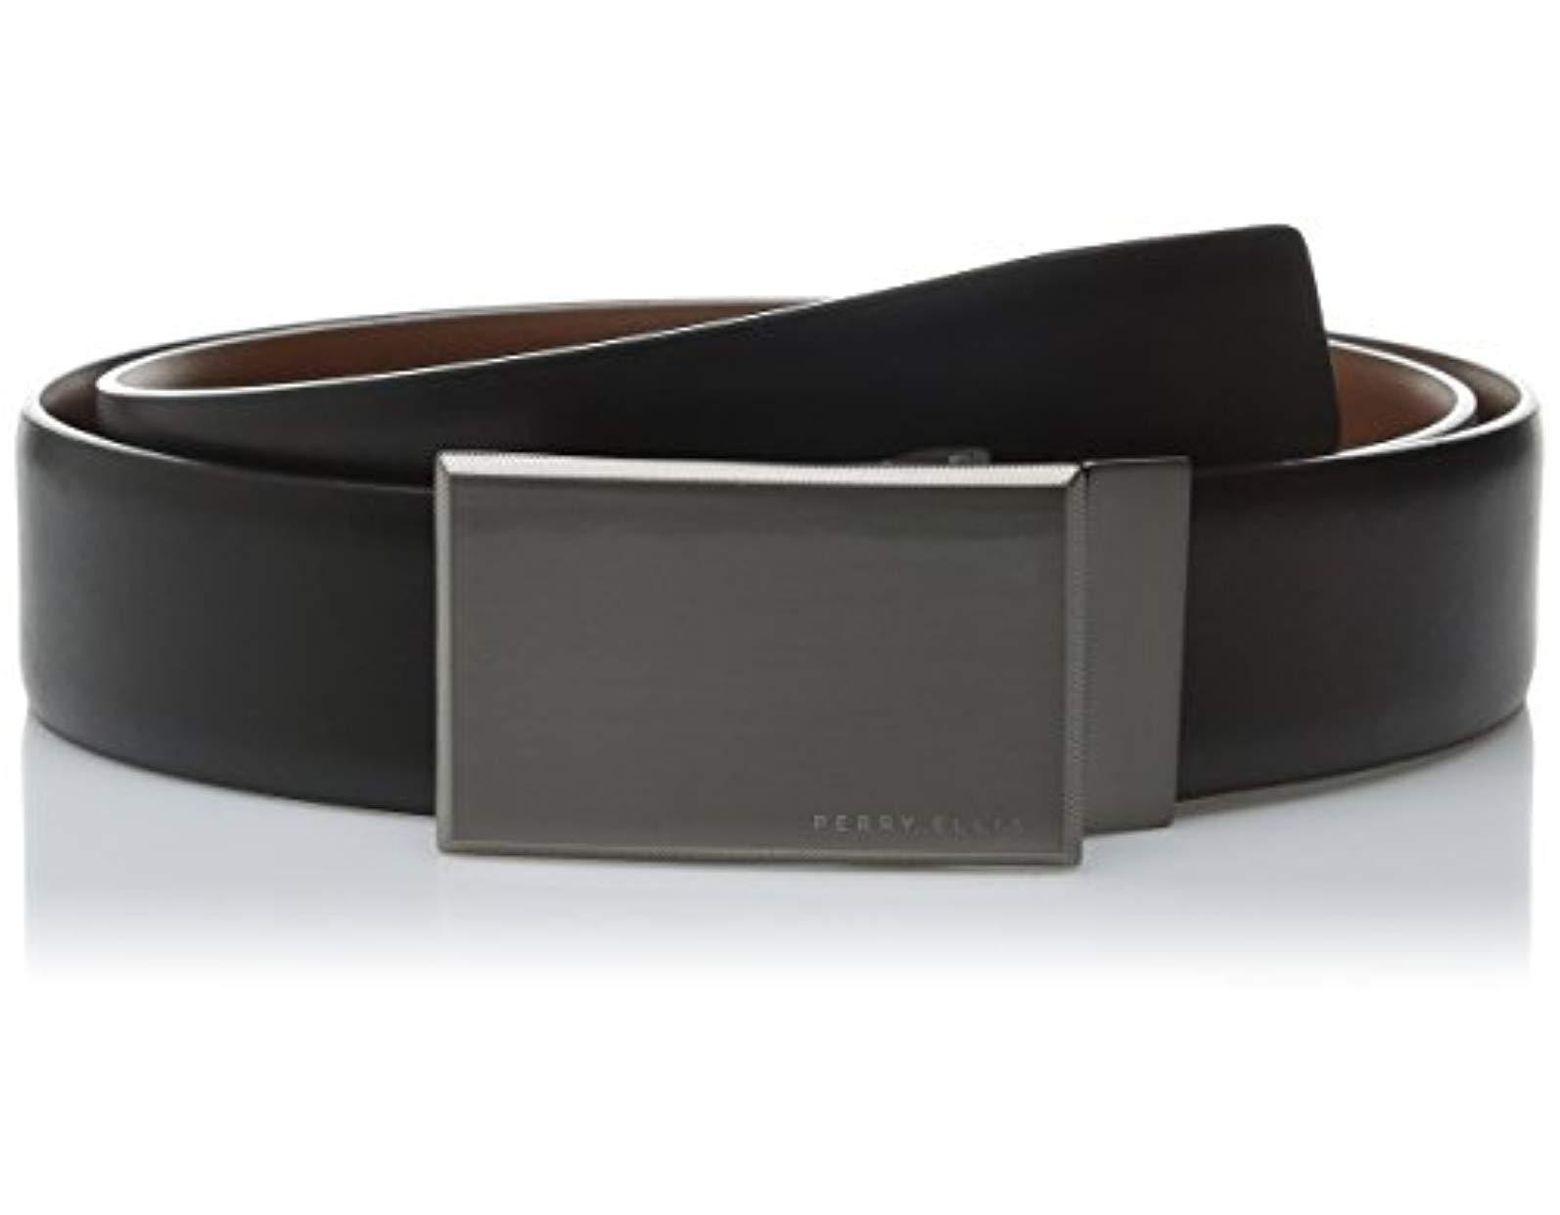 11b6adc1e7f1 Men's Black Portfolio Reversible Patterned Plaque Belt